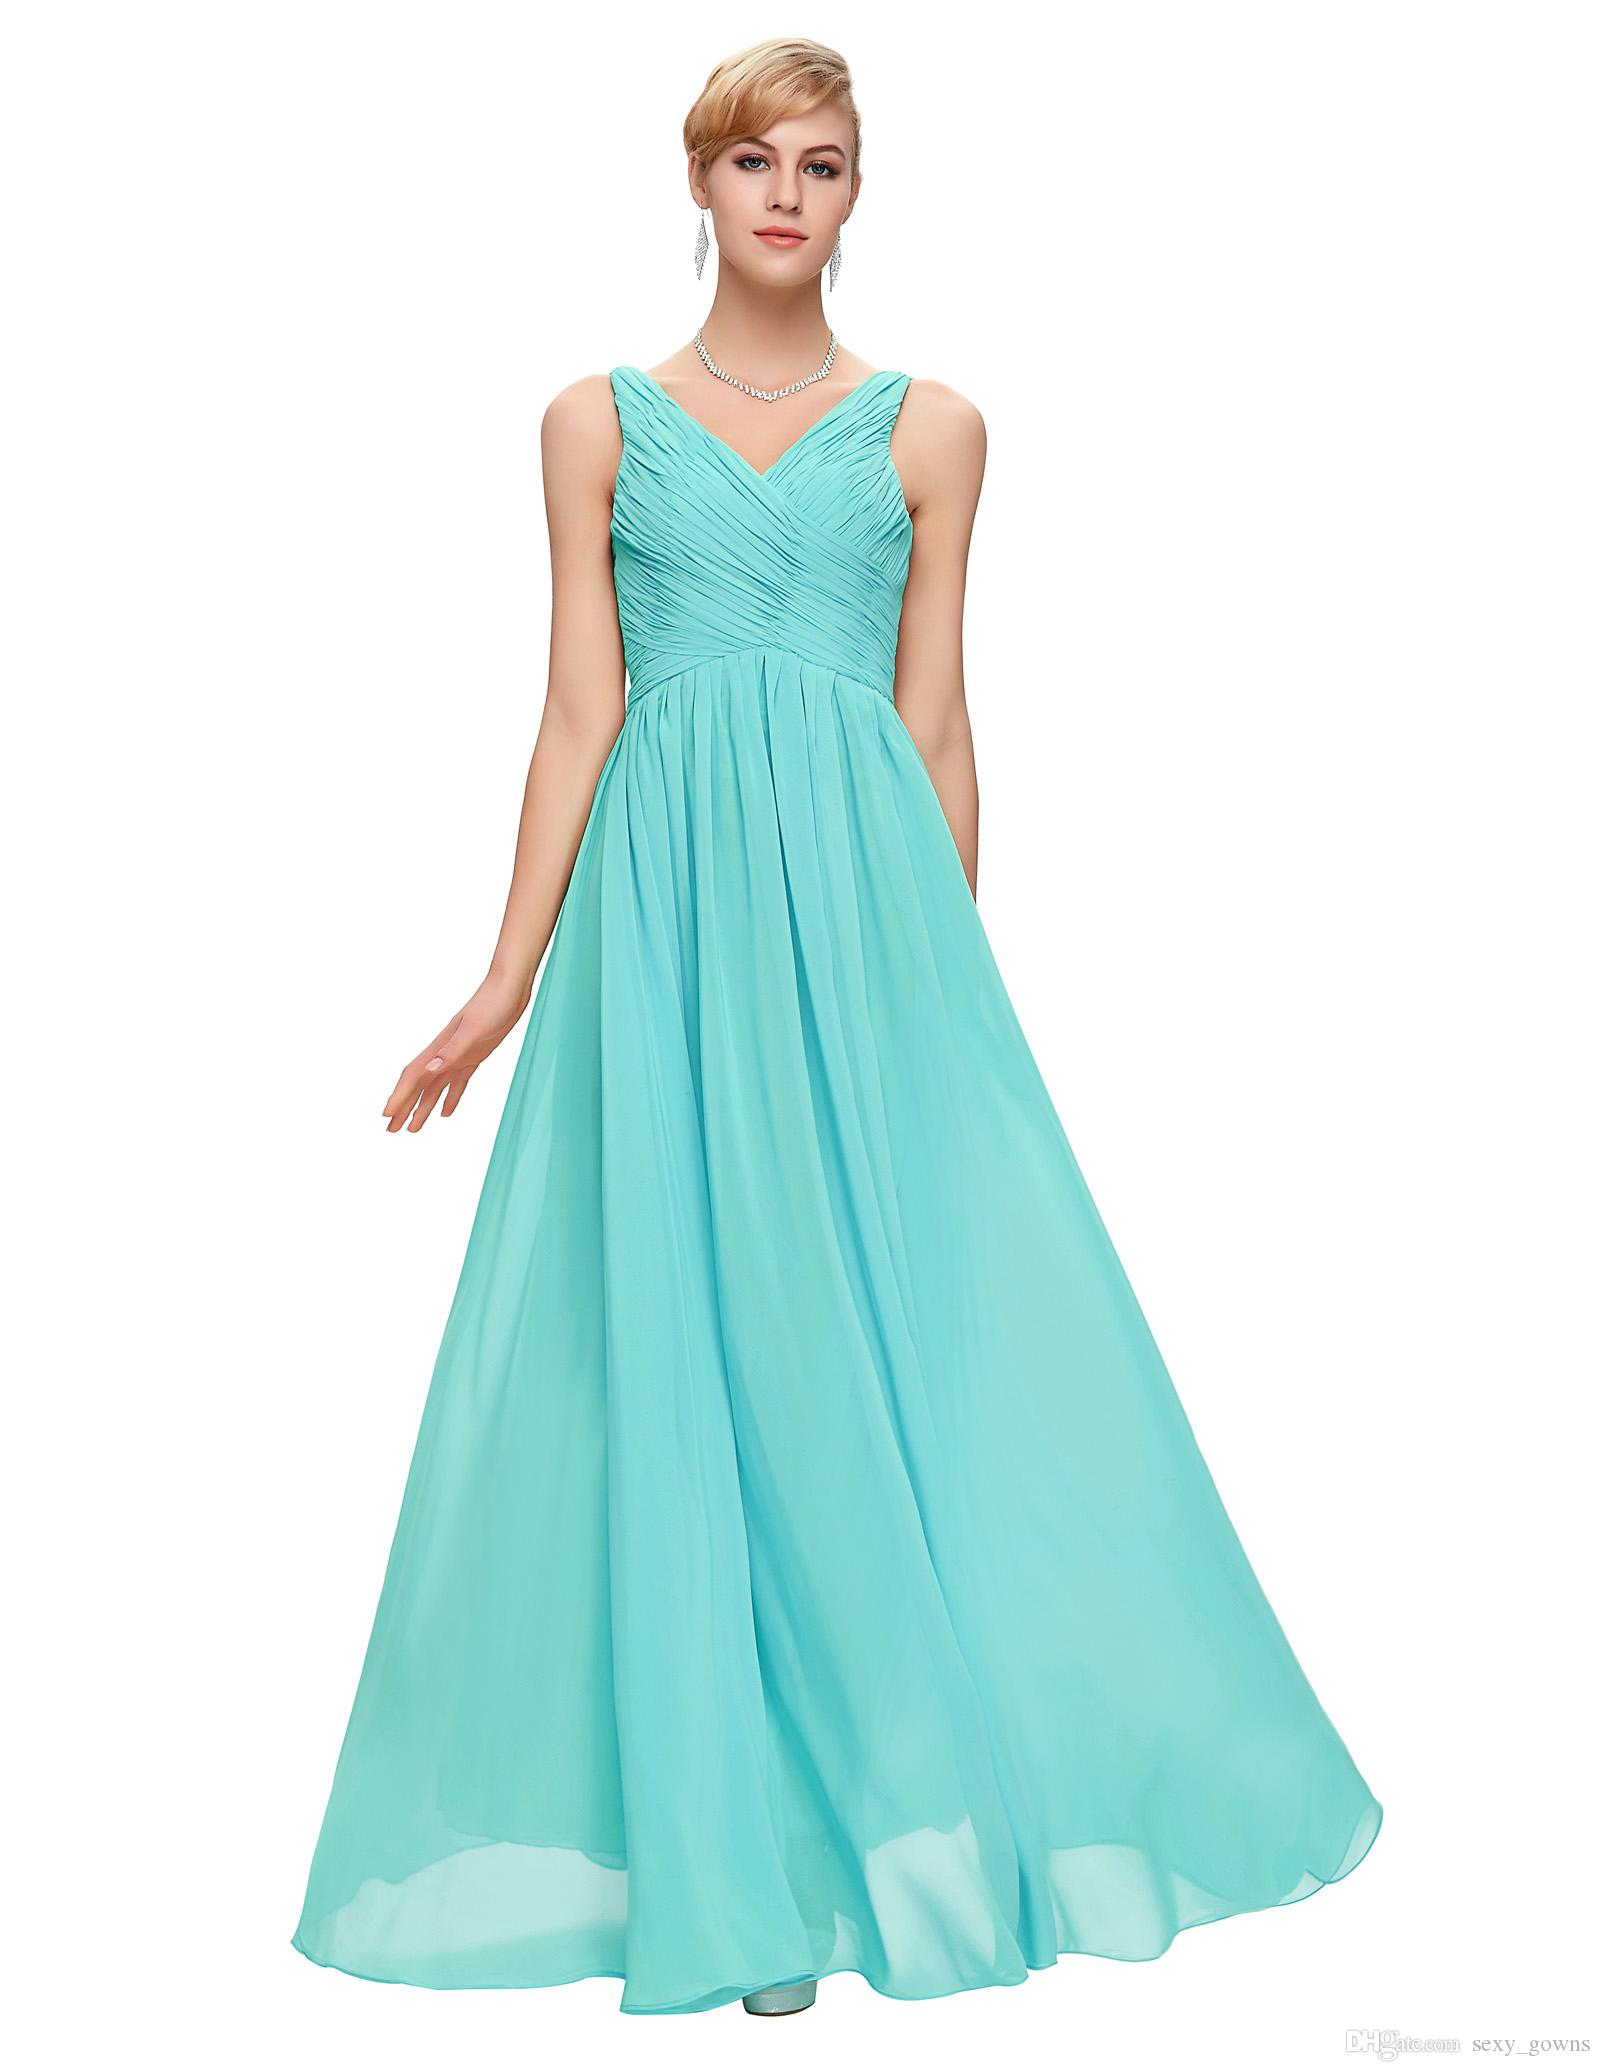 Cheap aqua blue bridesmaid dresses gallery braidsmaid dress cheap free shipping aqua blue bridesmaid dresses blush pink red cheap aqua blue bridesmaid dresses blush ombrellifo Choice Image